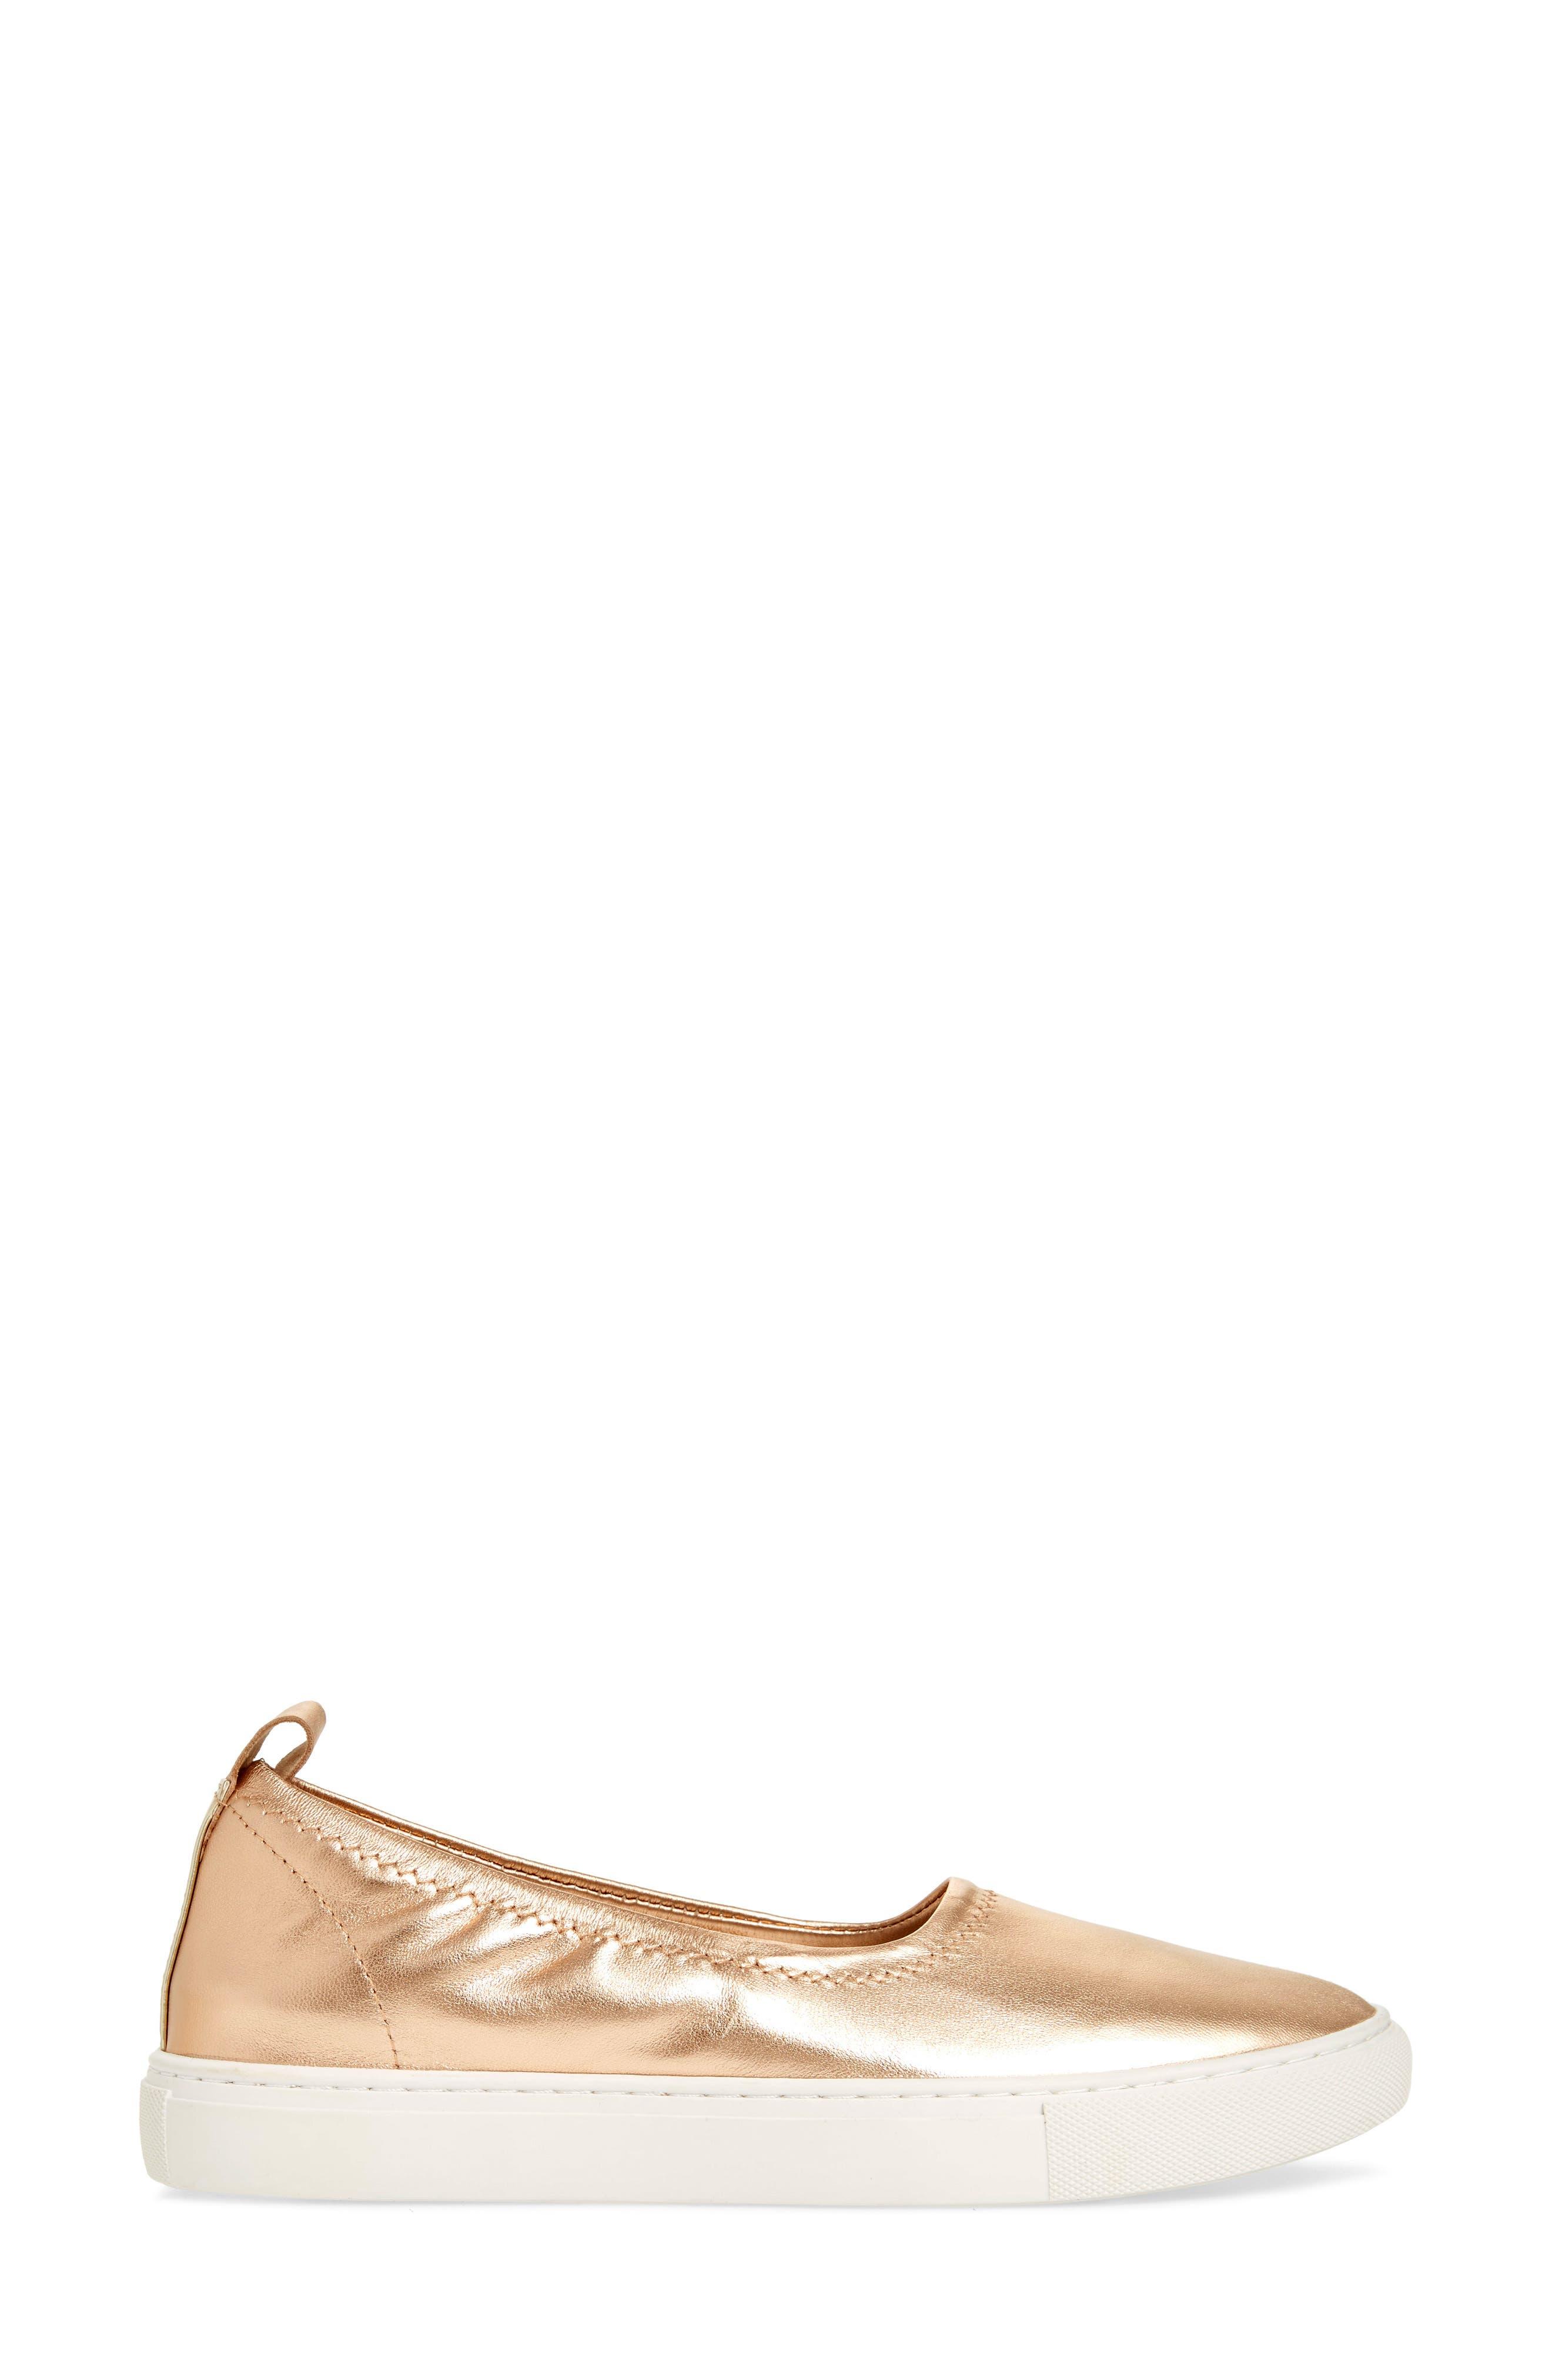 Kam Techni-Cole Ballet Flat,                             Alternate thumbnail 3, color,                             Rose Gold Leather